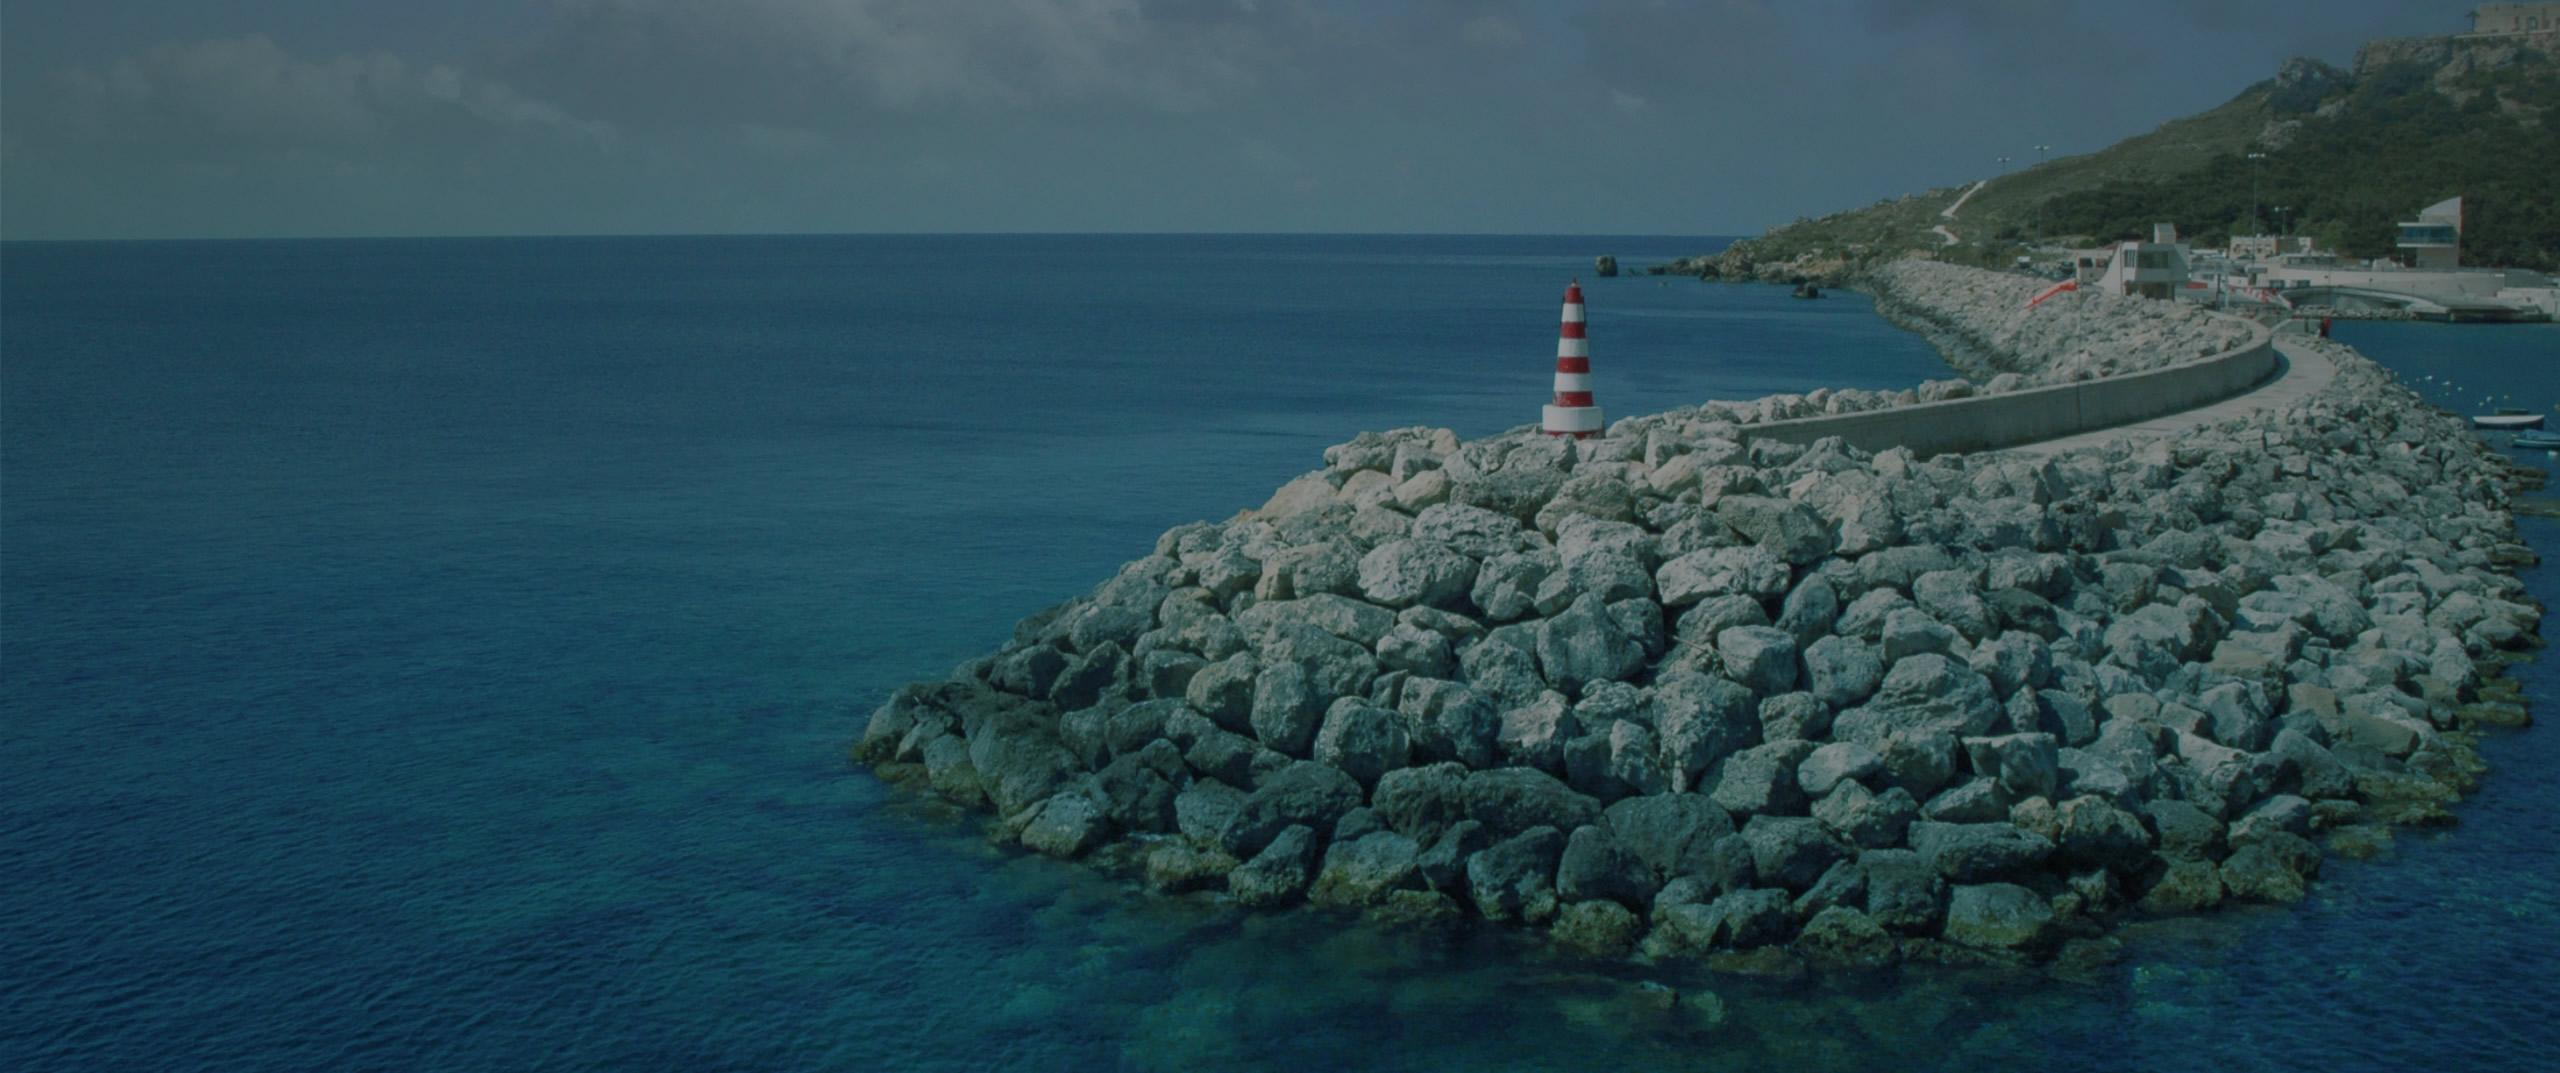 Shoreline-protection-2560